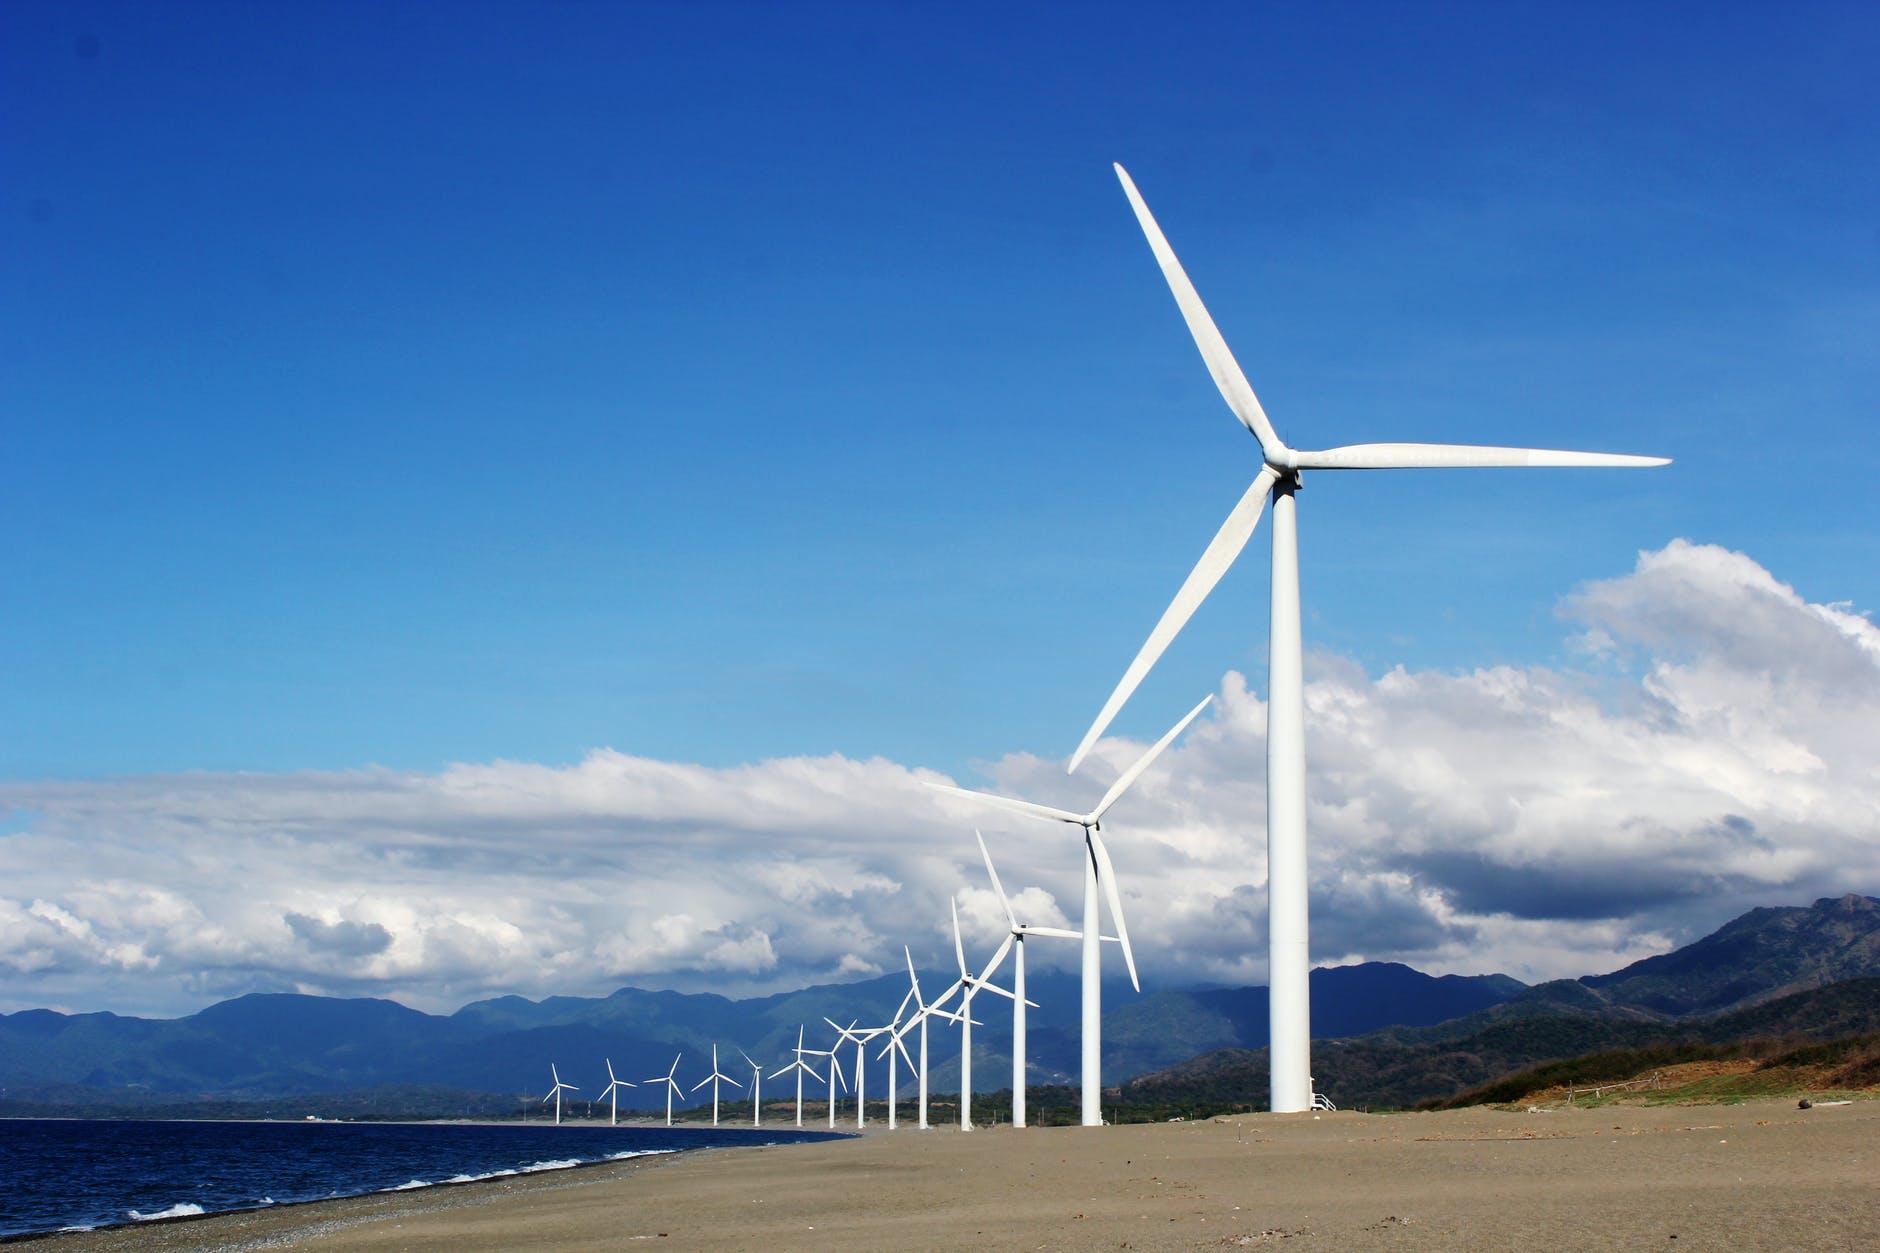 white wind turbines on gray sand near body of water